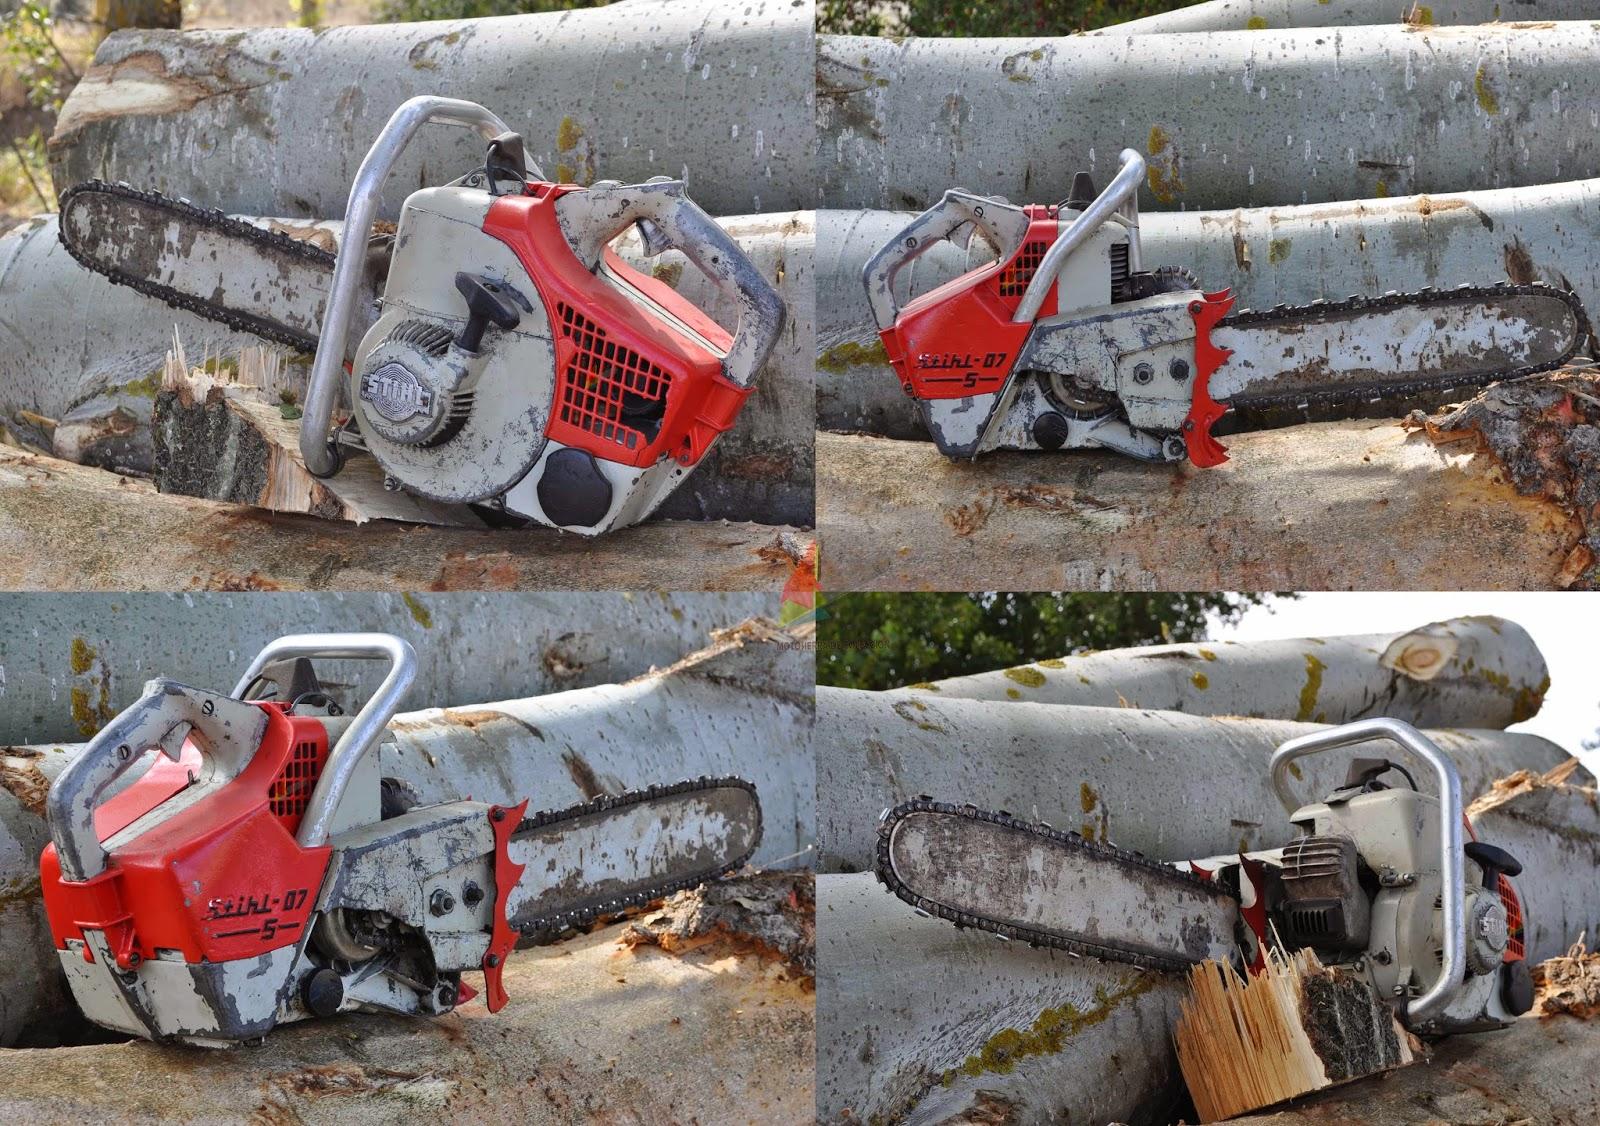 Vintage/Old Stihl Chainsaw - Motosierra Stihl Antigua